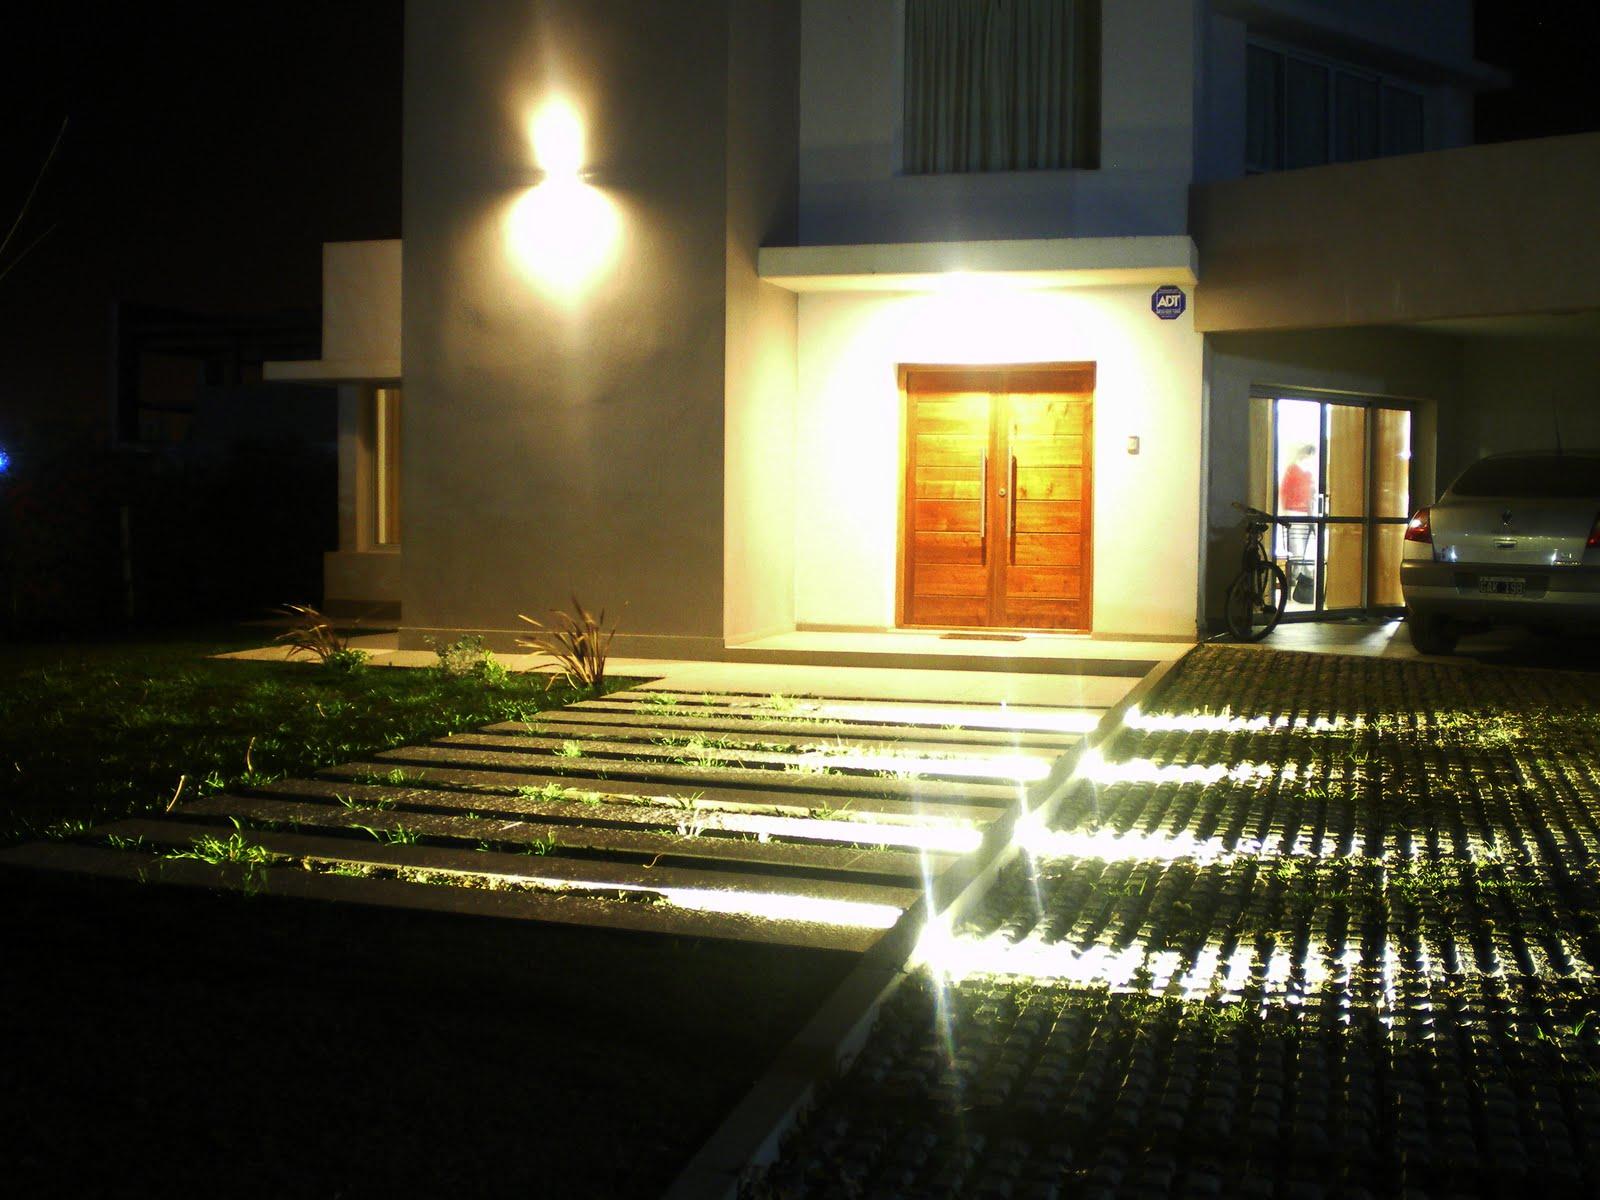 Venta de iluminaci n por led - Iluminacion exterior jardin ...